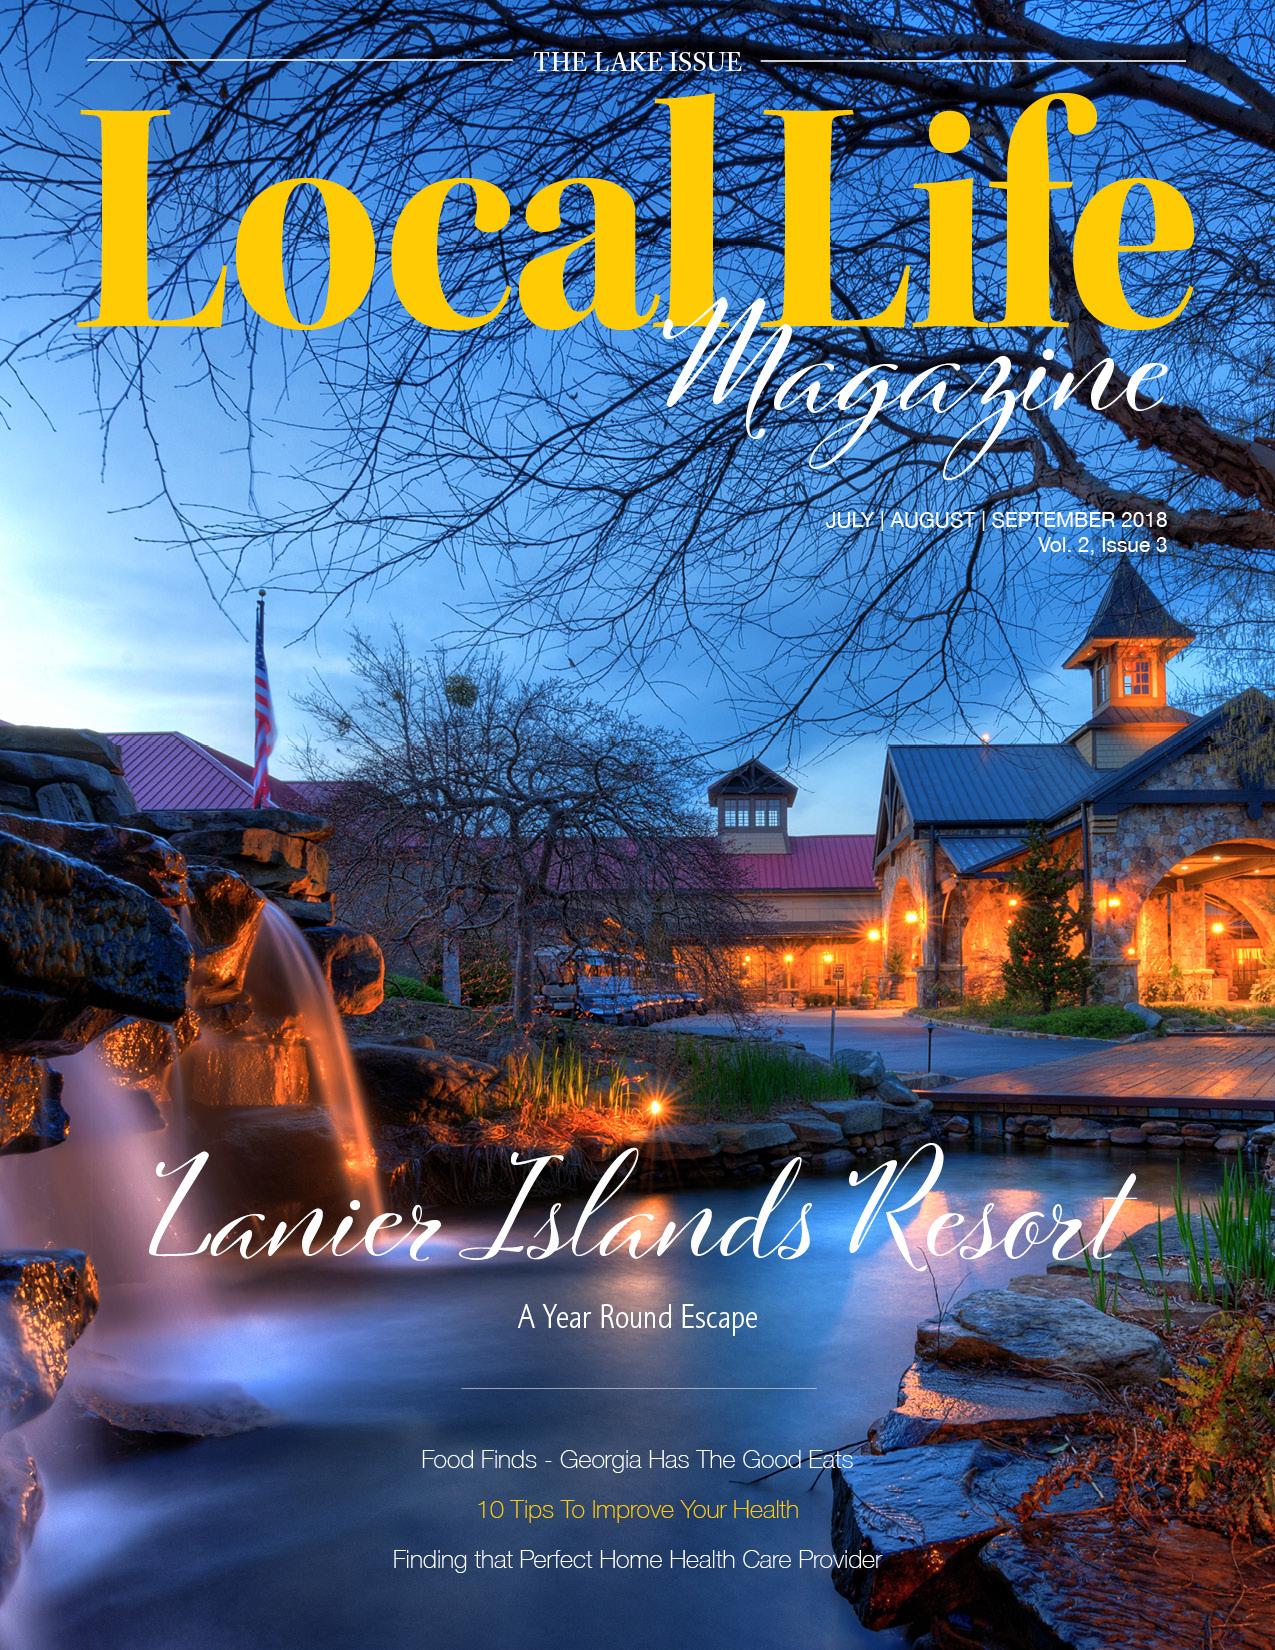 LLM Cover.july 2018.jpg